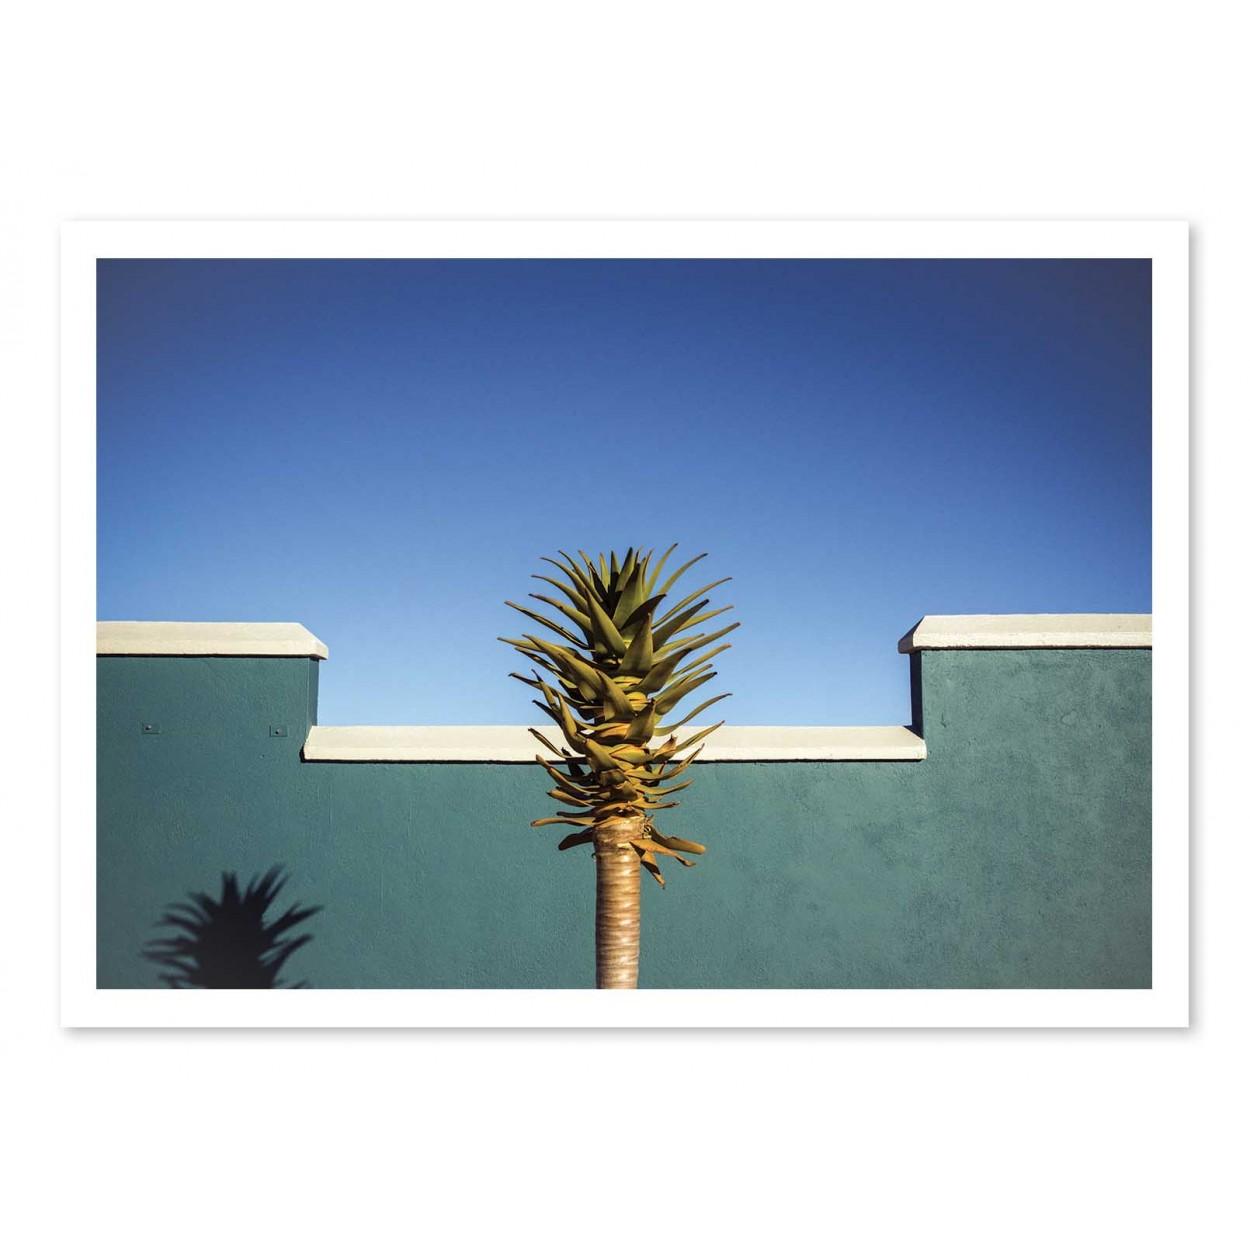 THE DESERT BLOOMS - Affiche d'art 50 x 70 cm - Linda Wride